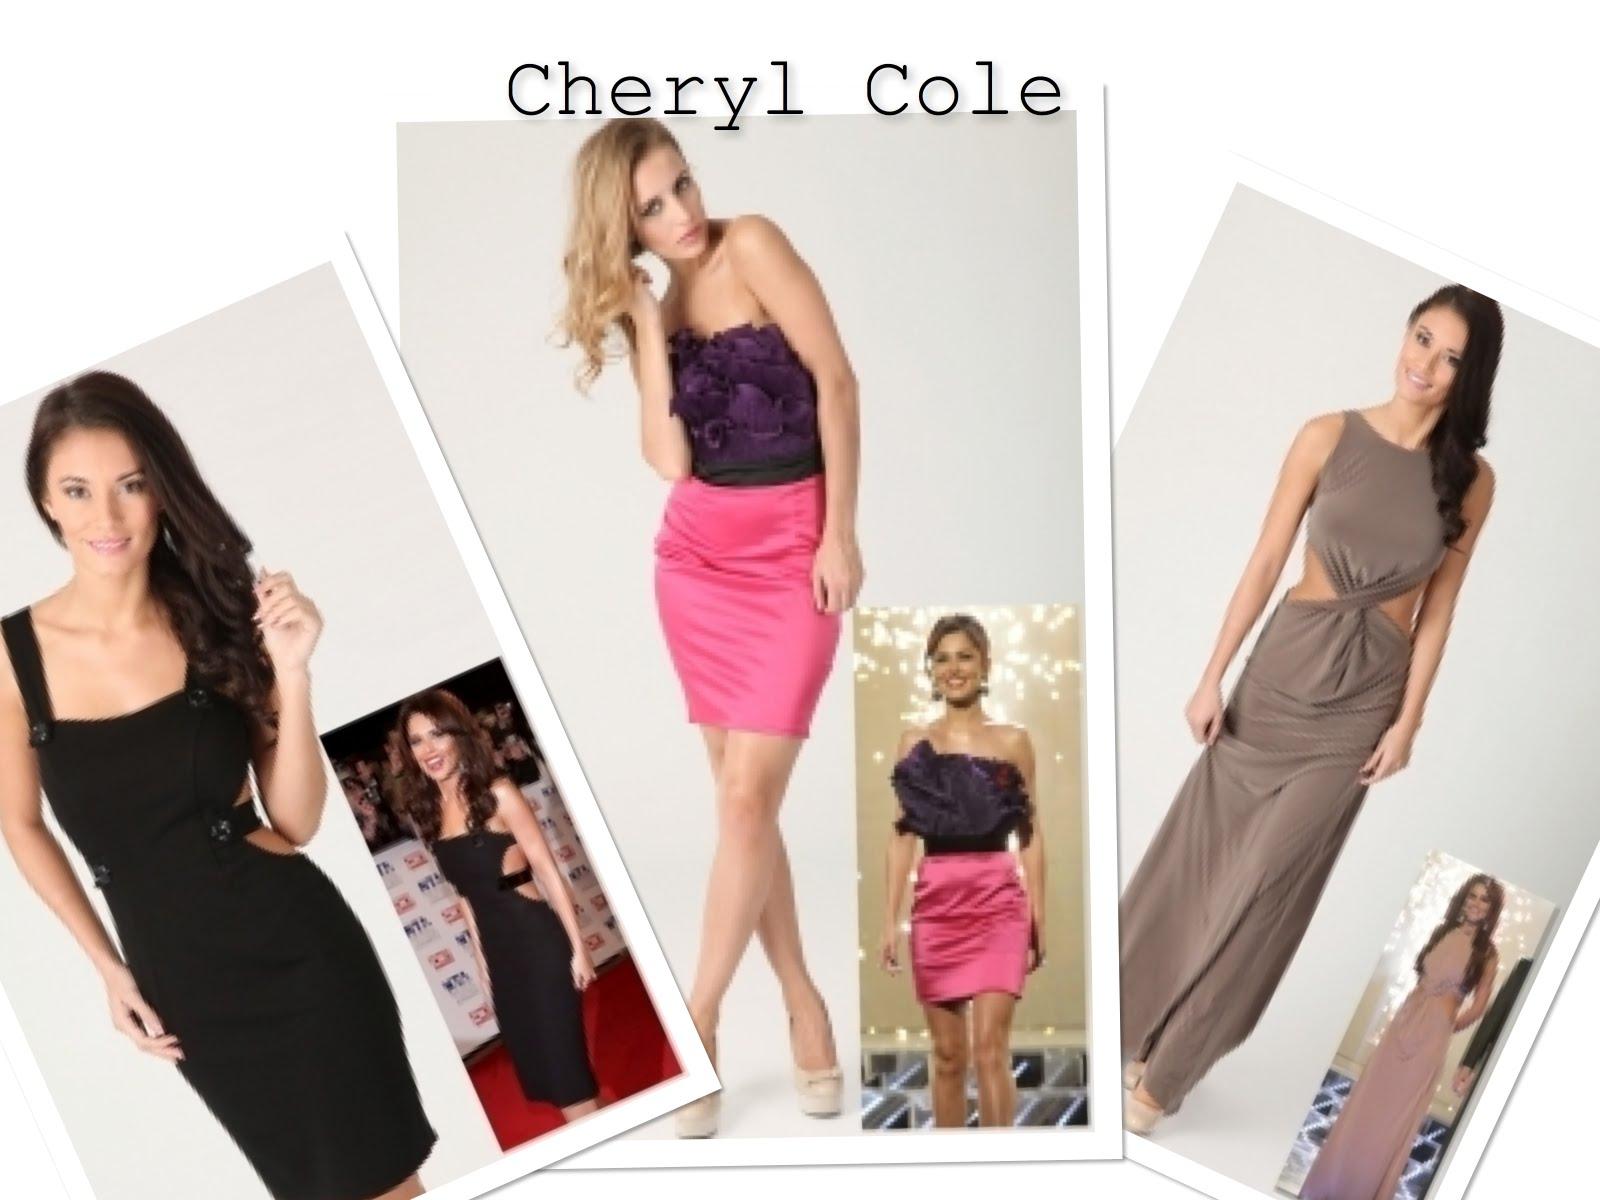 http://3.bp.blogspot.com/-7zi_YqQVJeA/Ti25H-zBccI/AAAAAAAAAbg/zsYxLQ5vDK8/s1600/Missguided+-+Cheryl+Cole.jpg